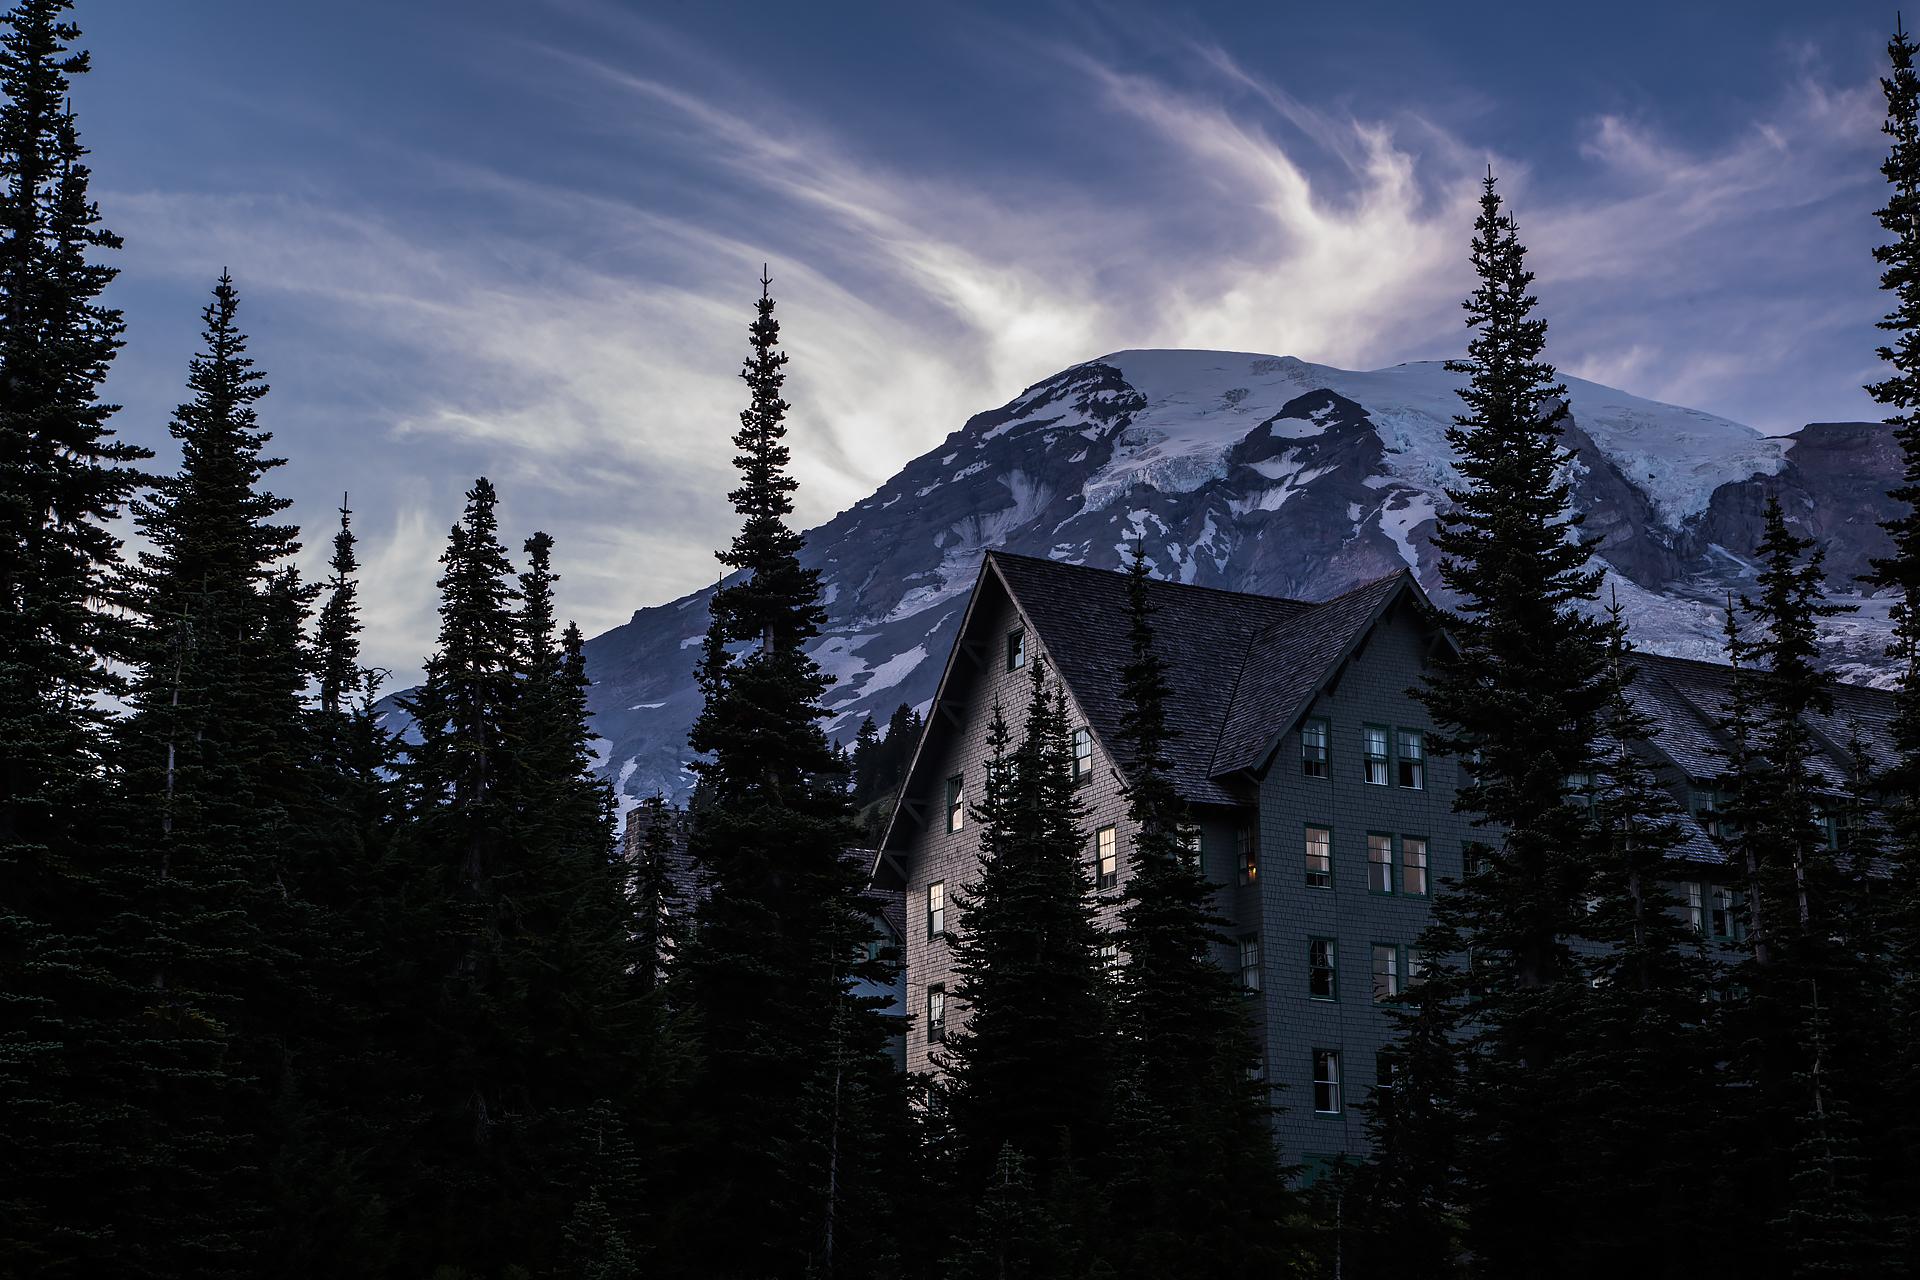 20130821-Mount-Rainier-Day-1-100.jpg